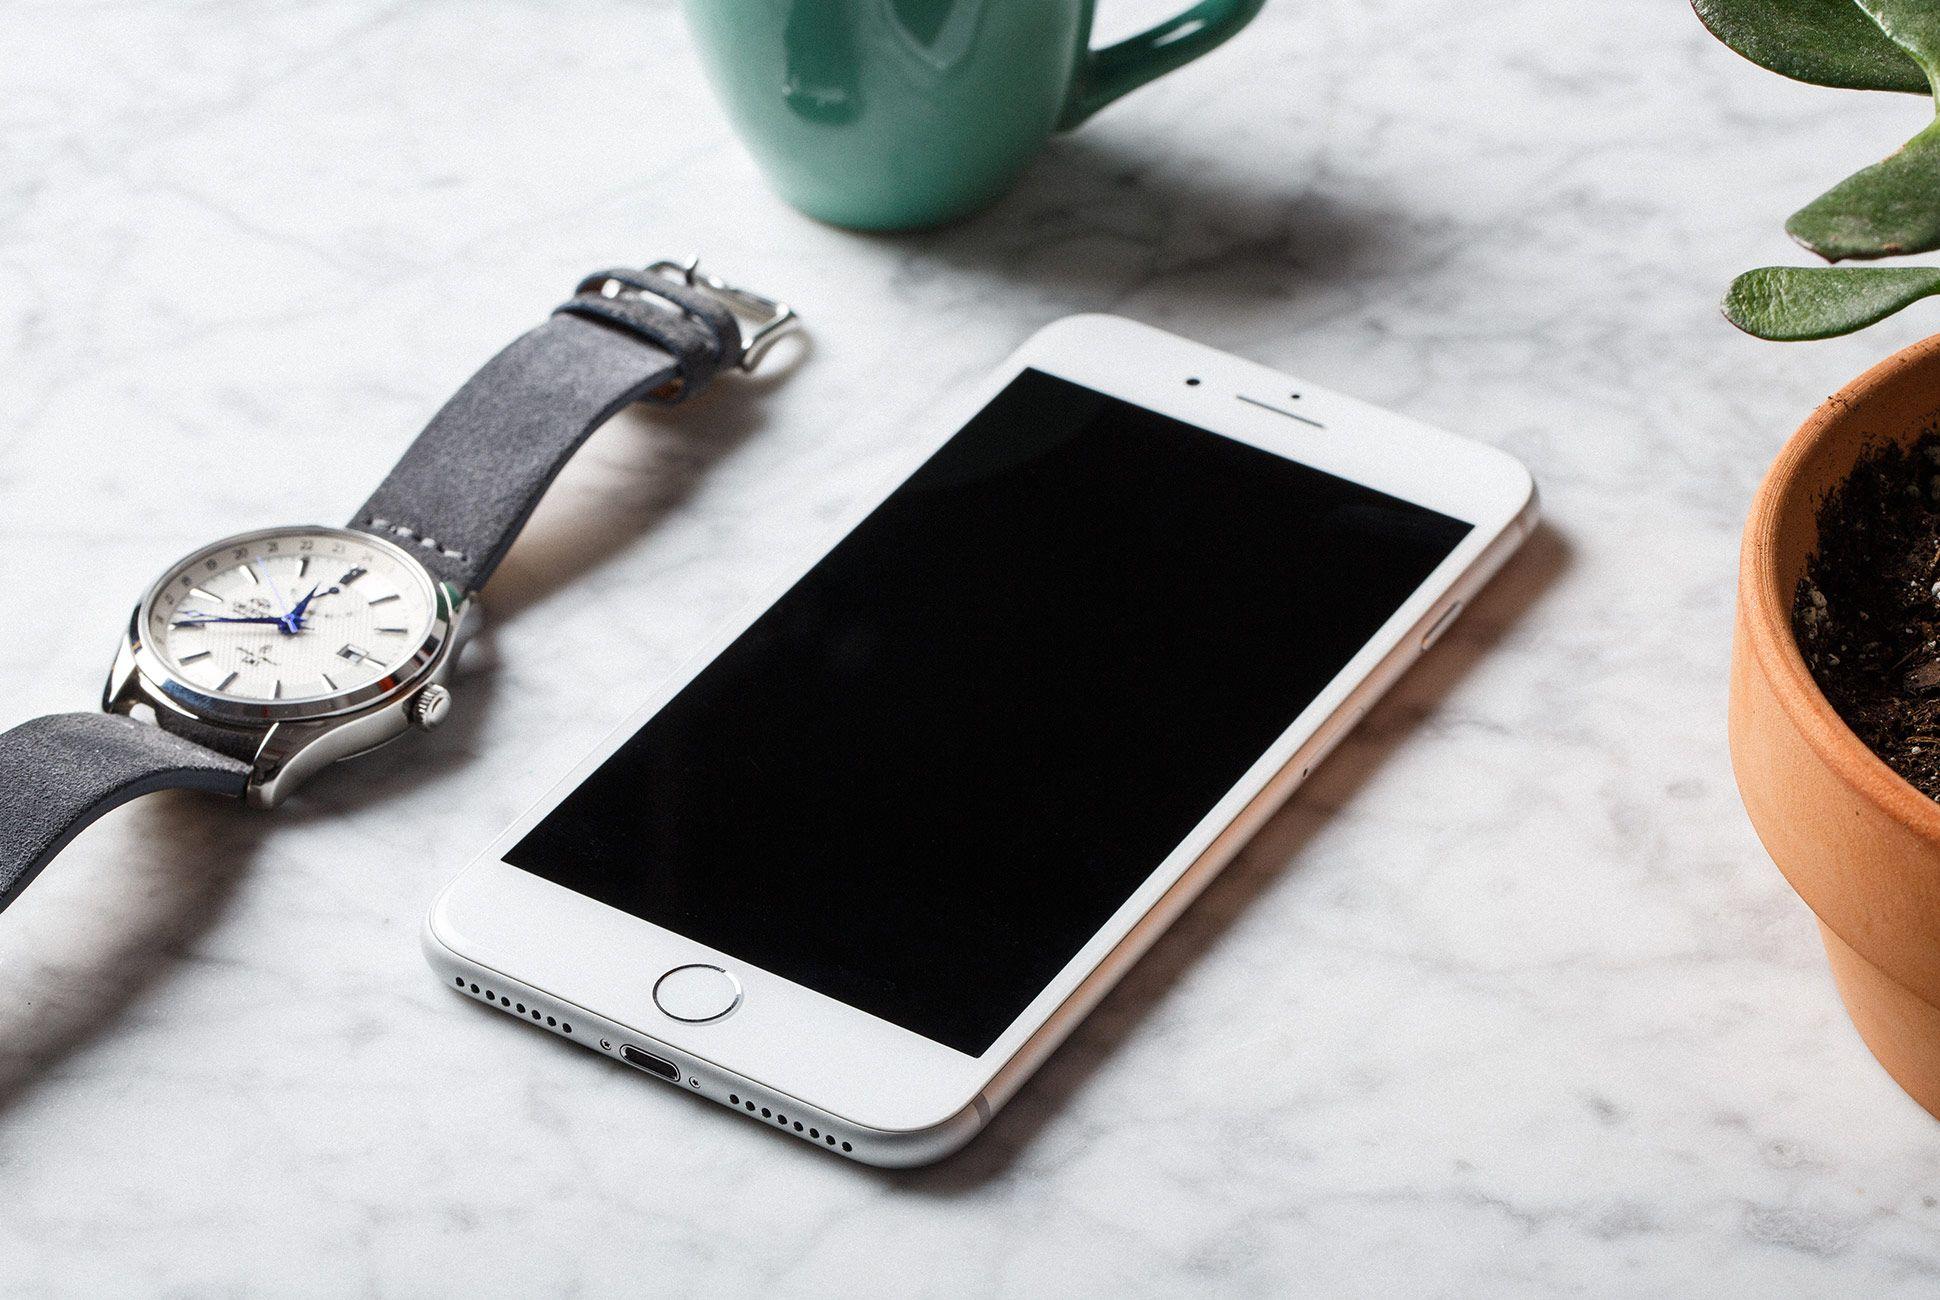 Apple-iPhone-8+-gear-patrol-3